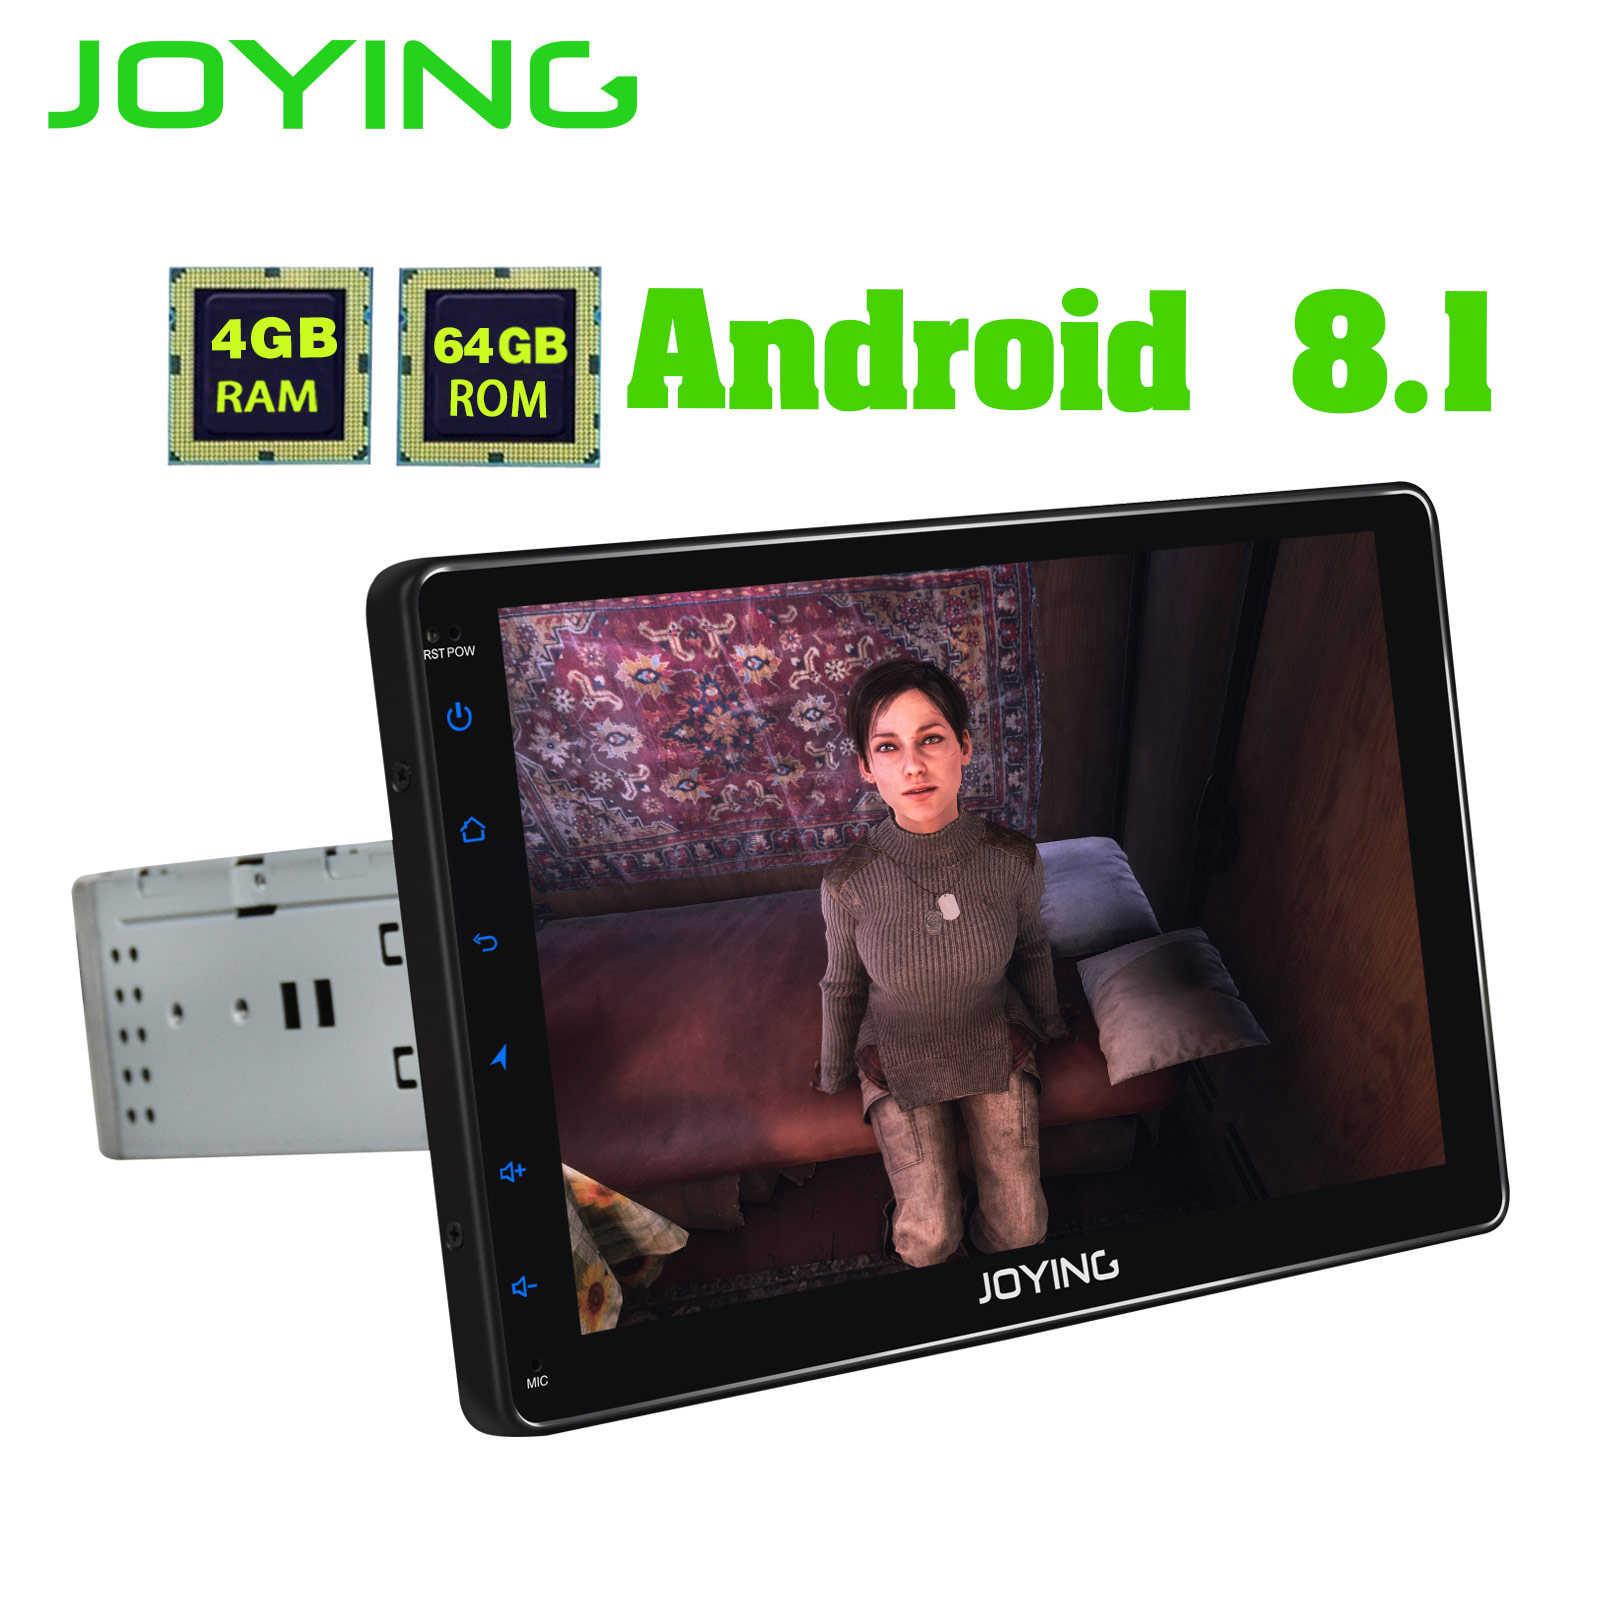 JOYING Eu 在庫 1din アンドロイド 8.1 カー autoradio ステレオ gps ナビゲーションシステムマルチメディアプレーヤーサポート DAB + DVR OBD2 リアカメラ